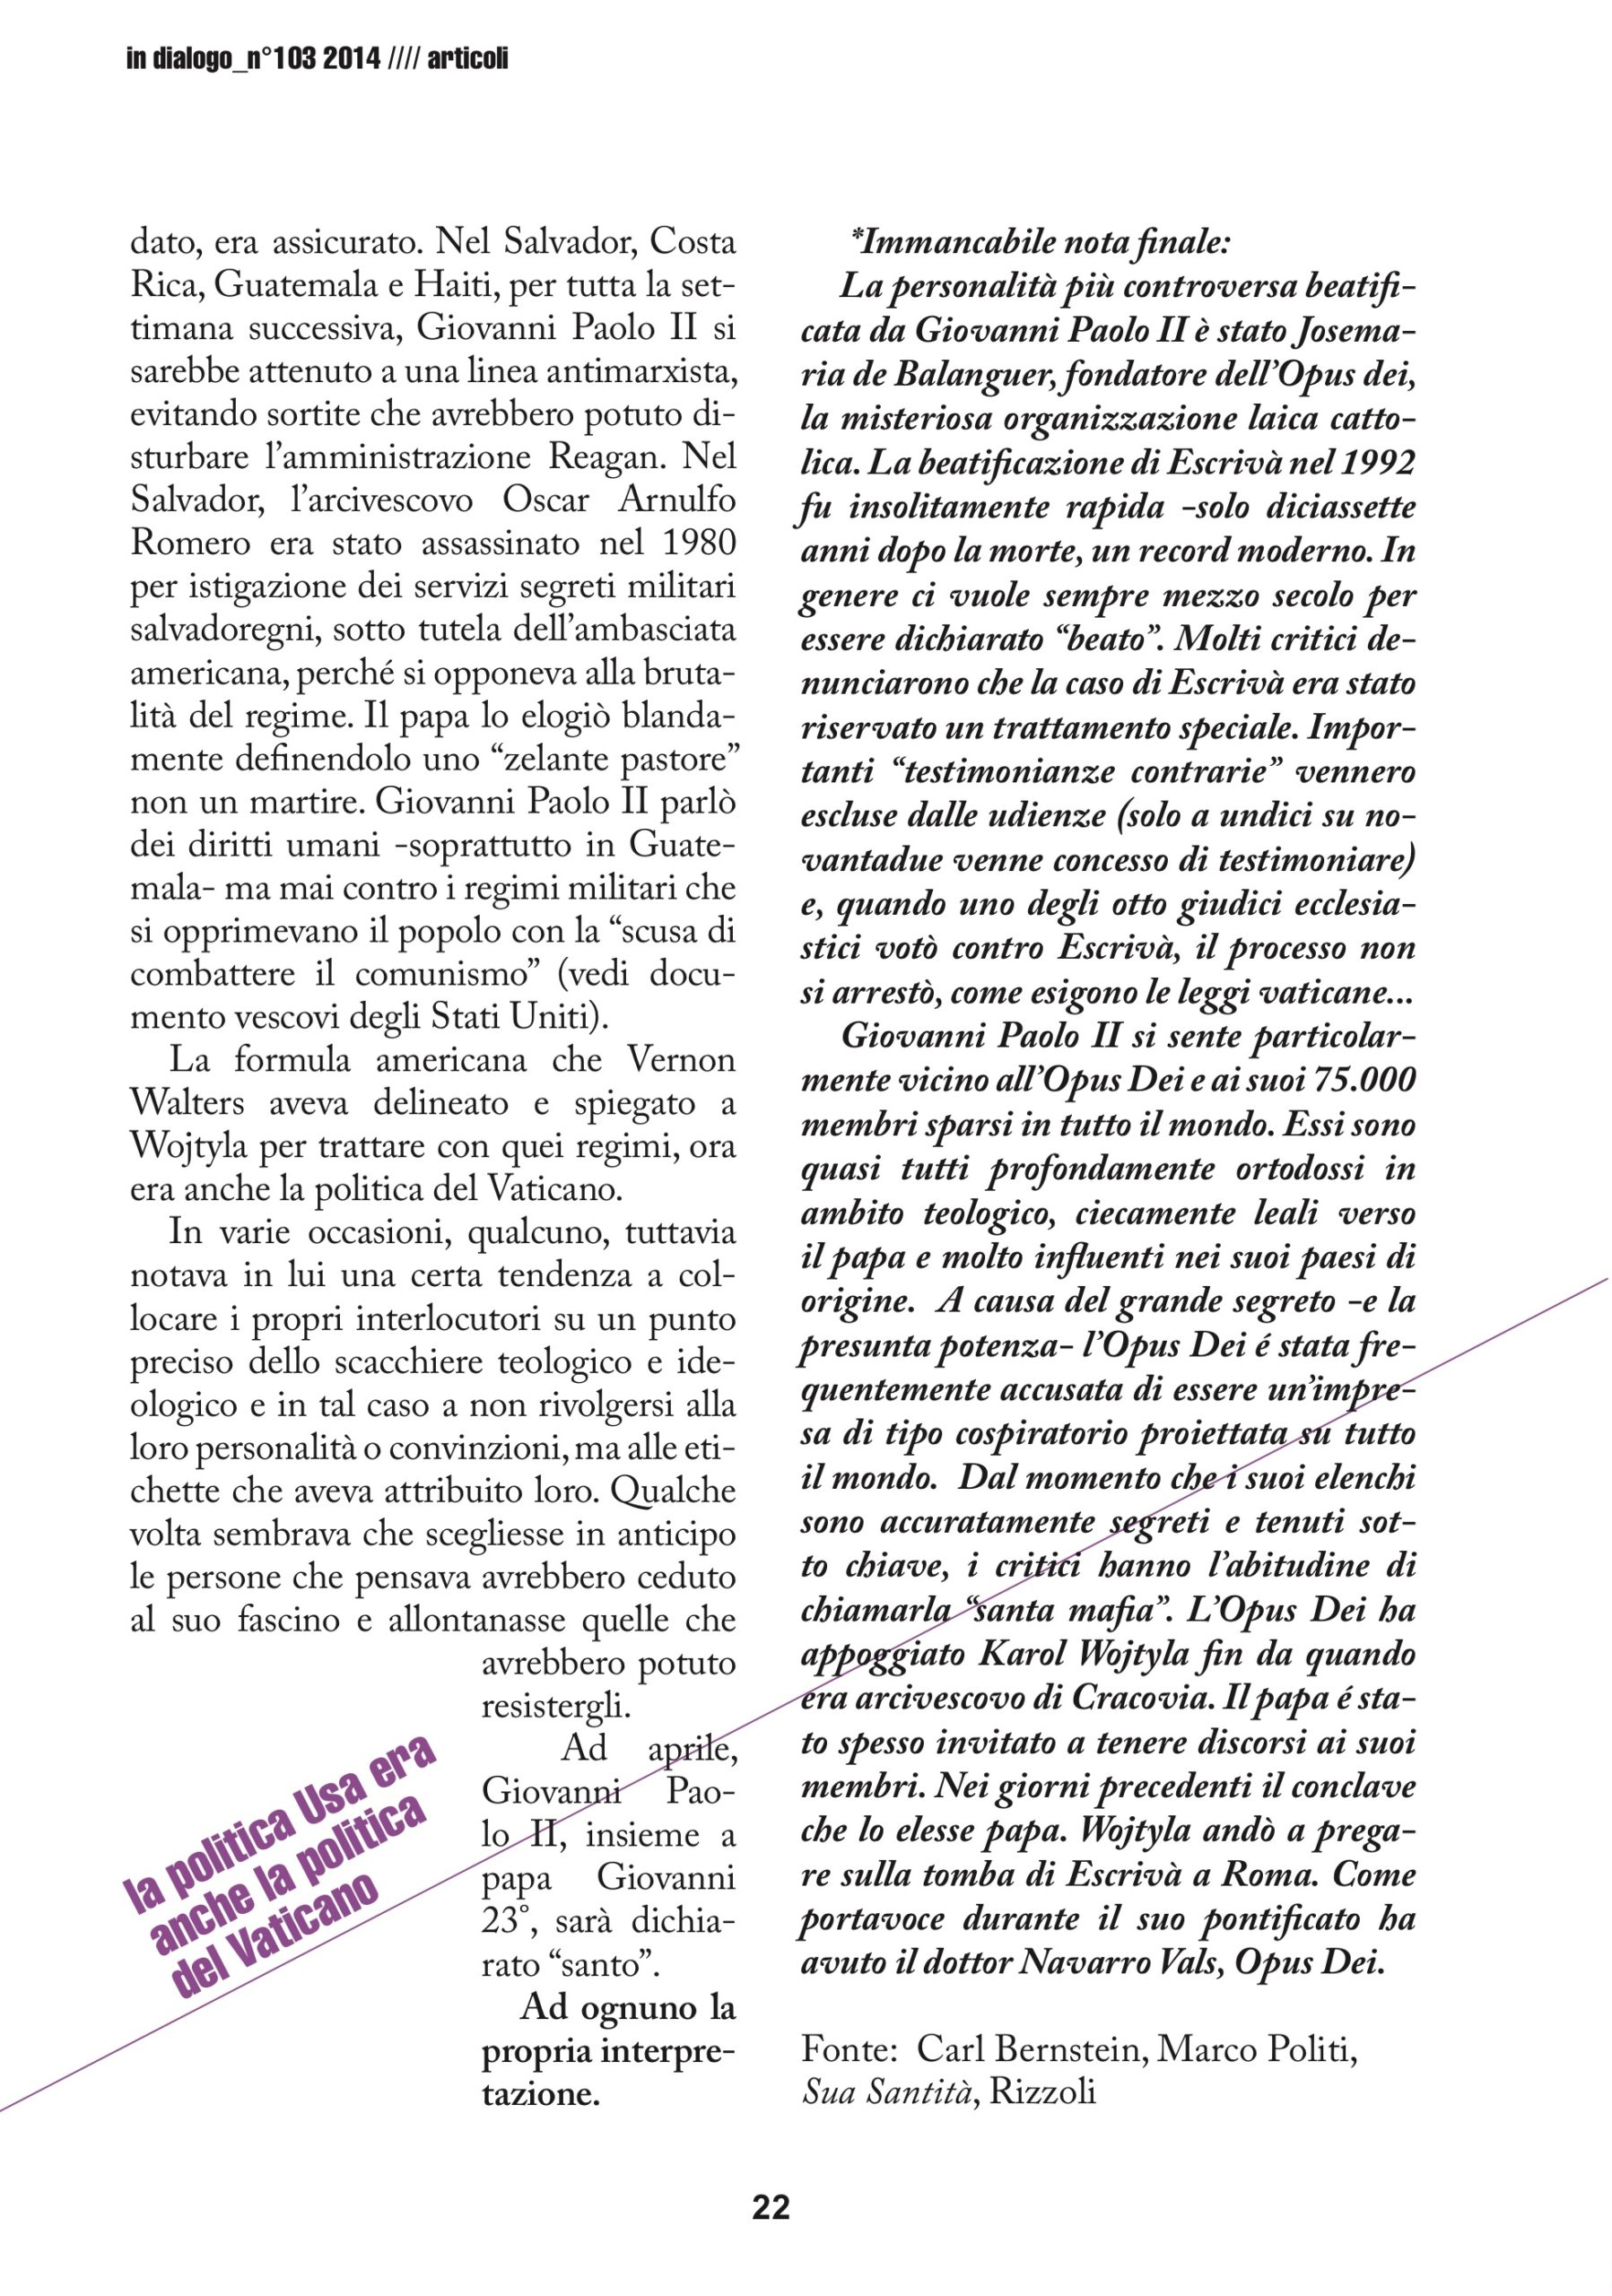 Vermigli GPII páginas 13 - 22-10